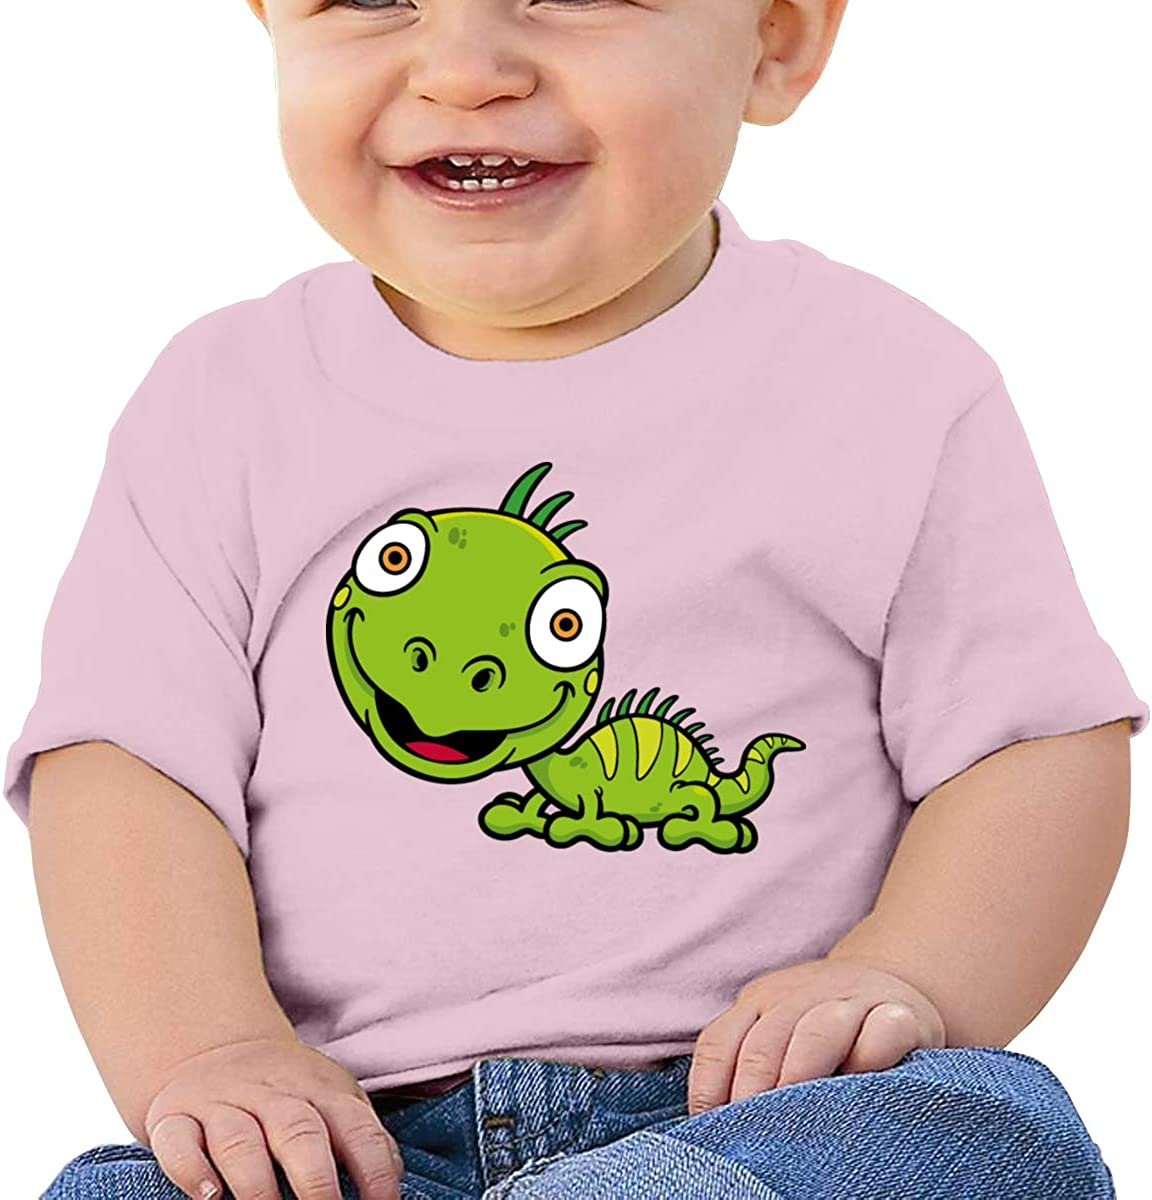 Go Vegan Pig Short Sleeve Tshirt Toddler Girl Birthday Gift